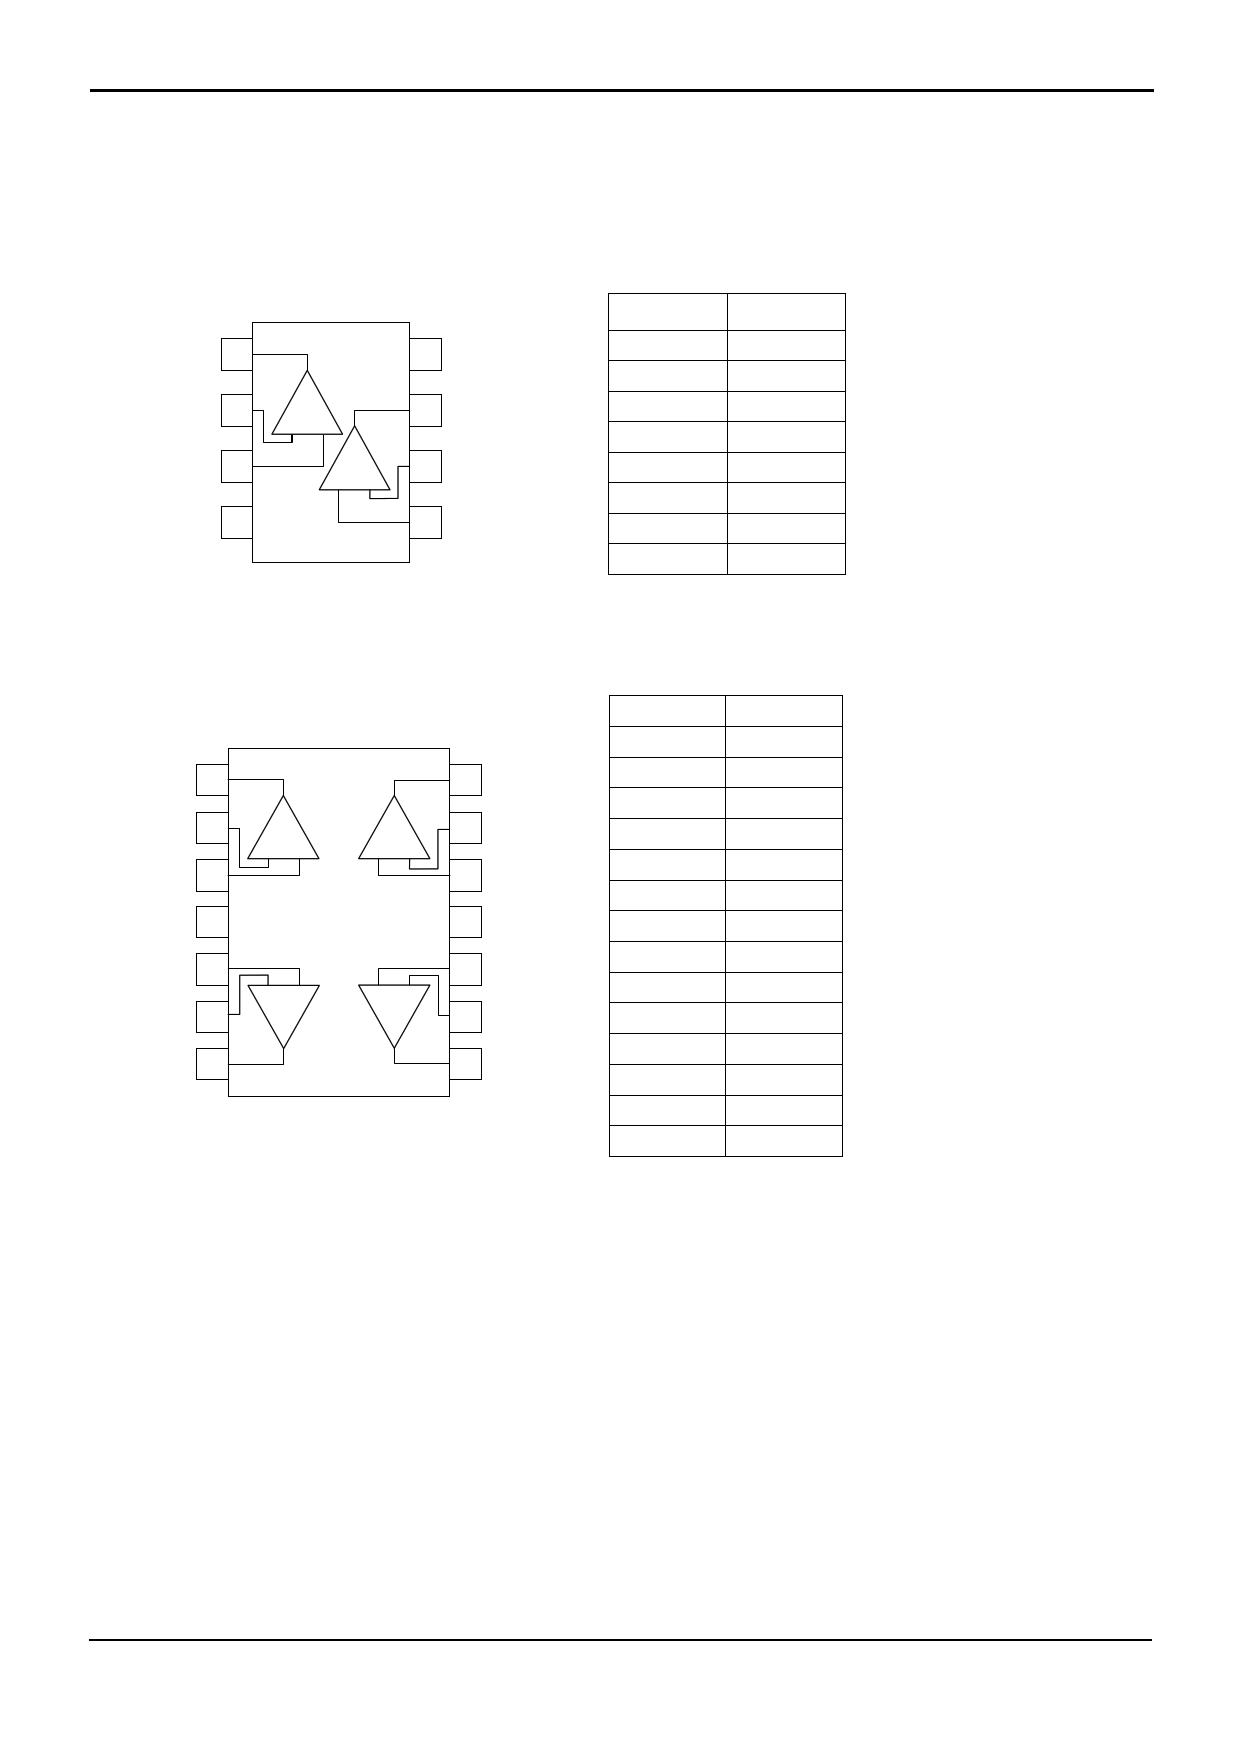 TLR344FJ pdf, schematic